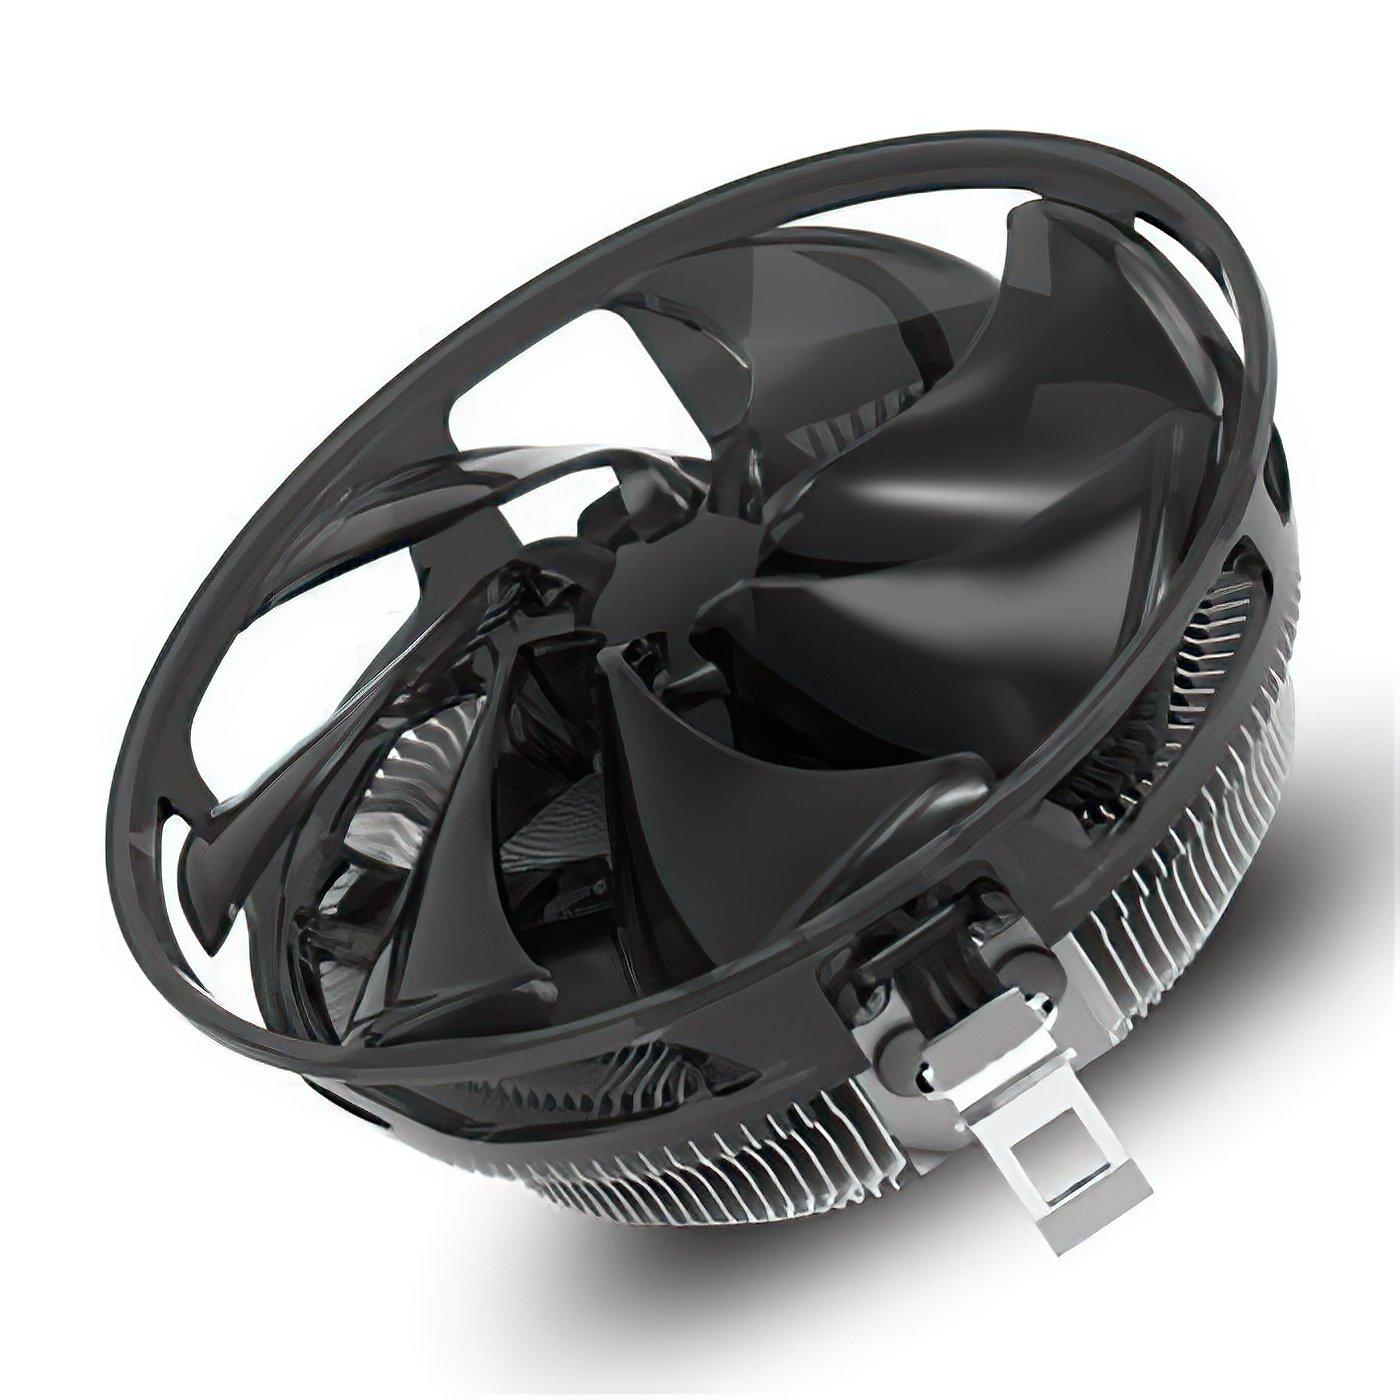 Процесорний кулер Cooler Master Z70 (RH-Z70-18FK-R1) фото